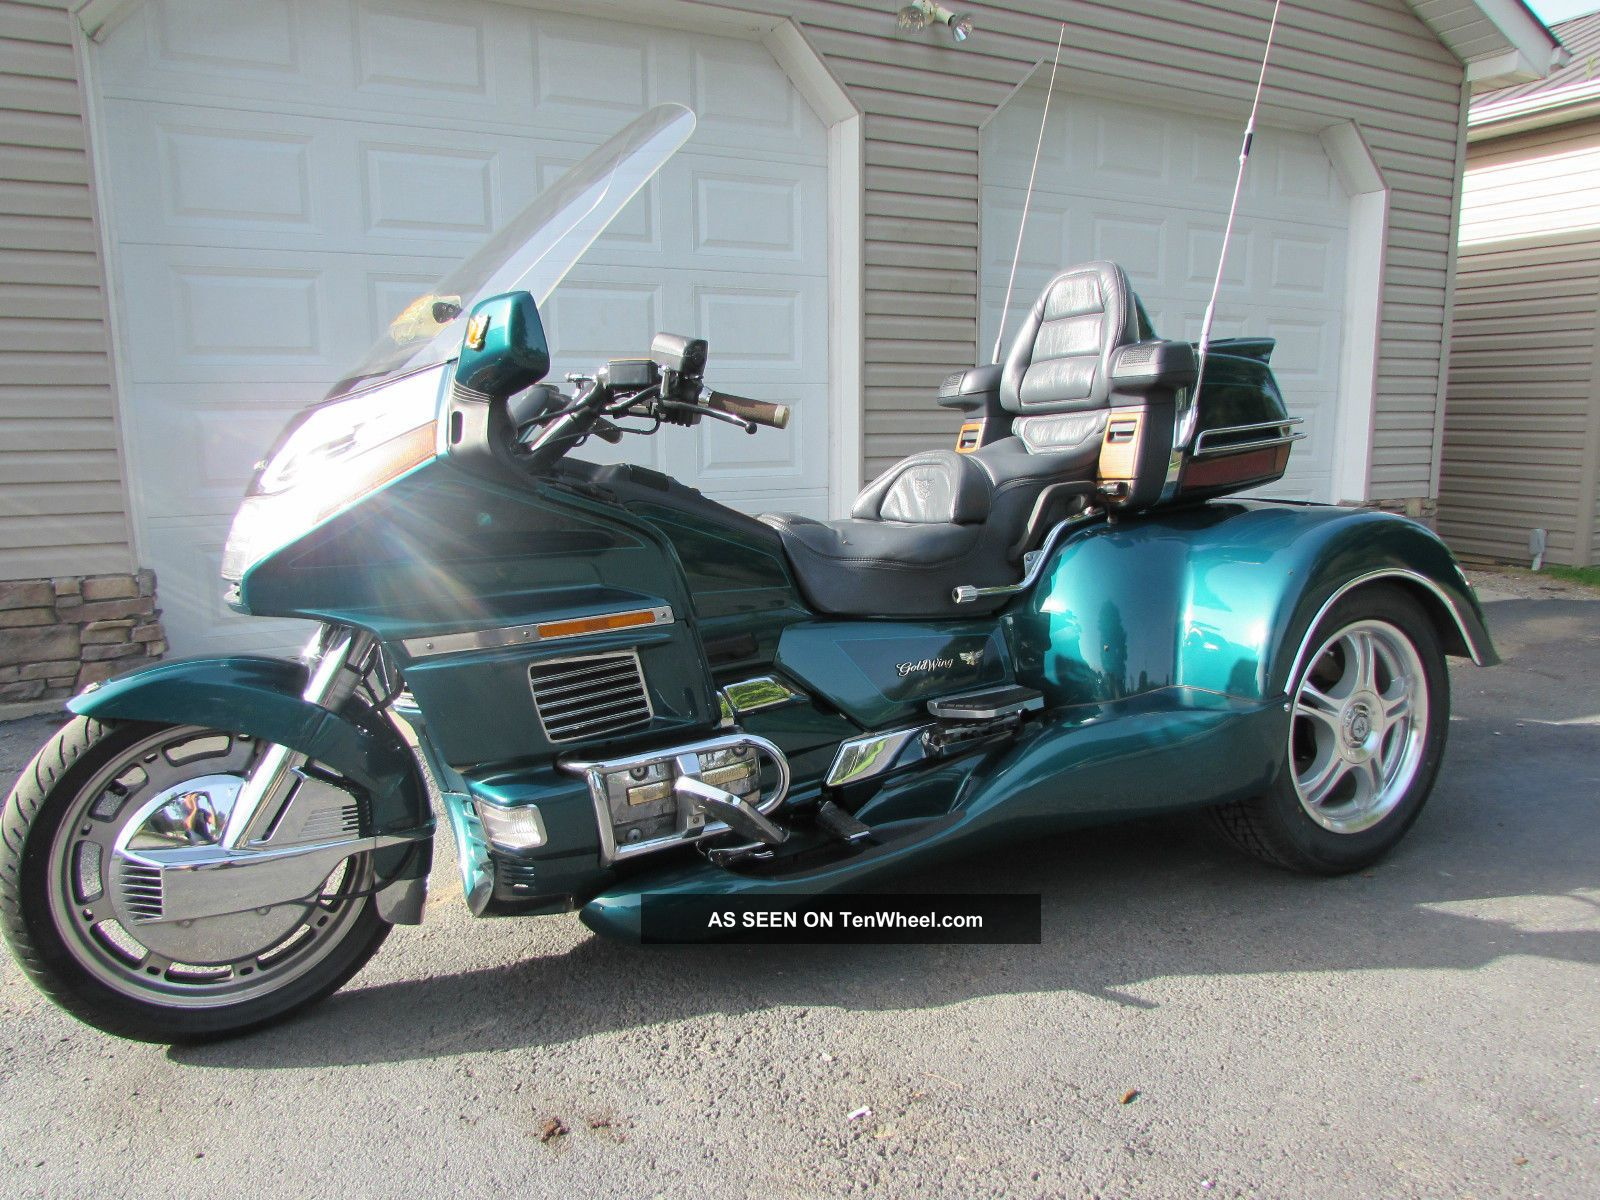 Pin 1996 honda goldwing trike gl1500 california side car amp 1993